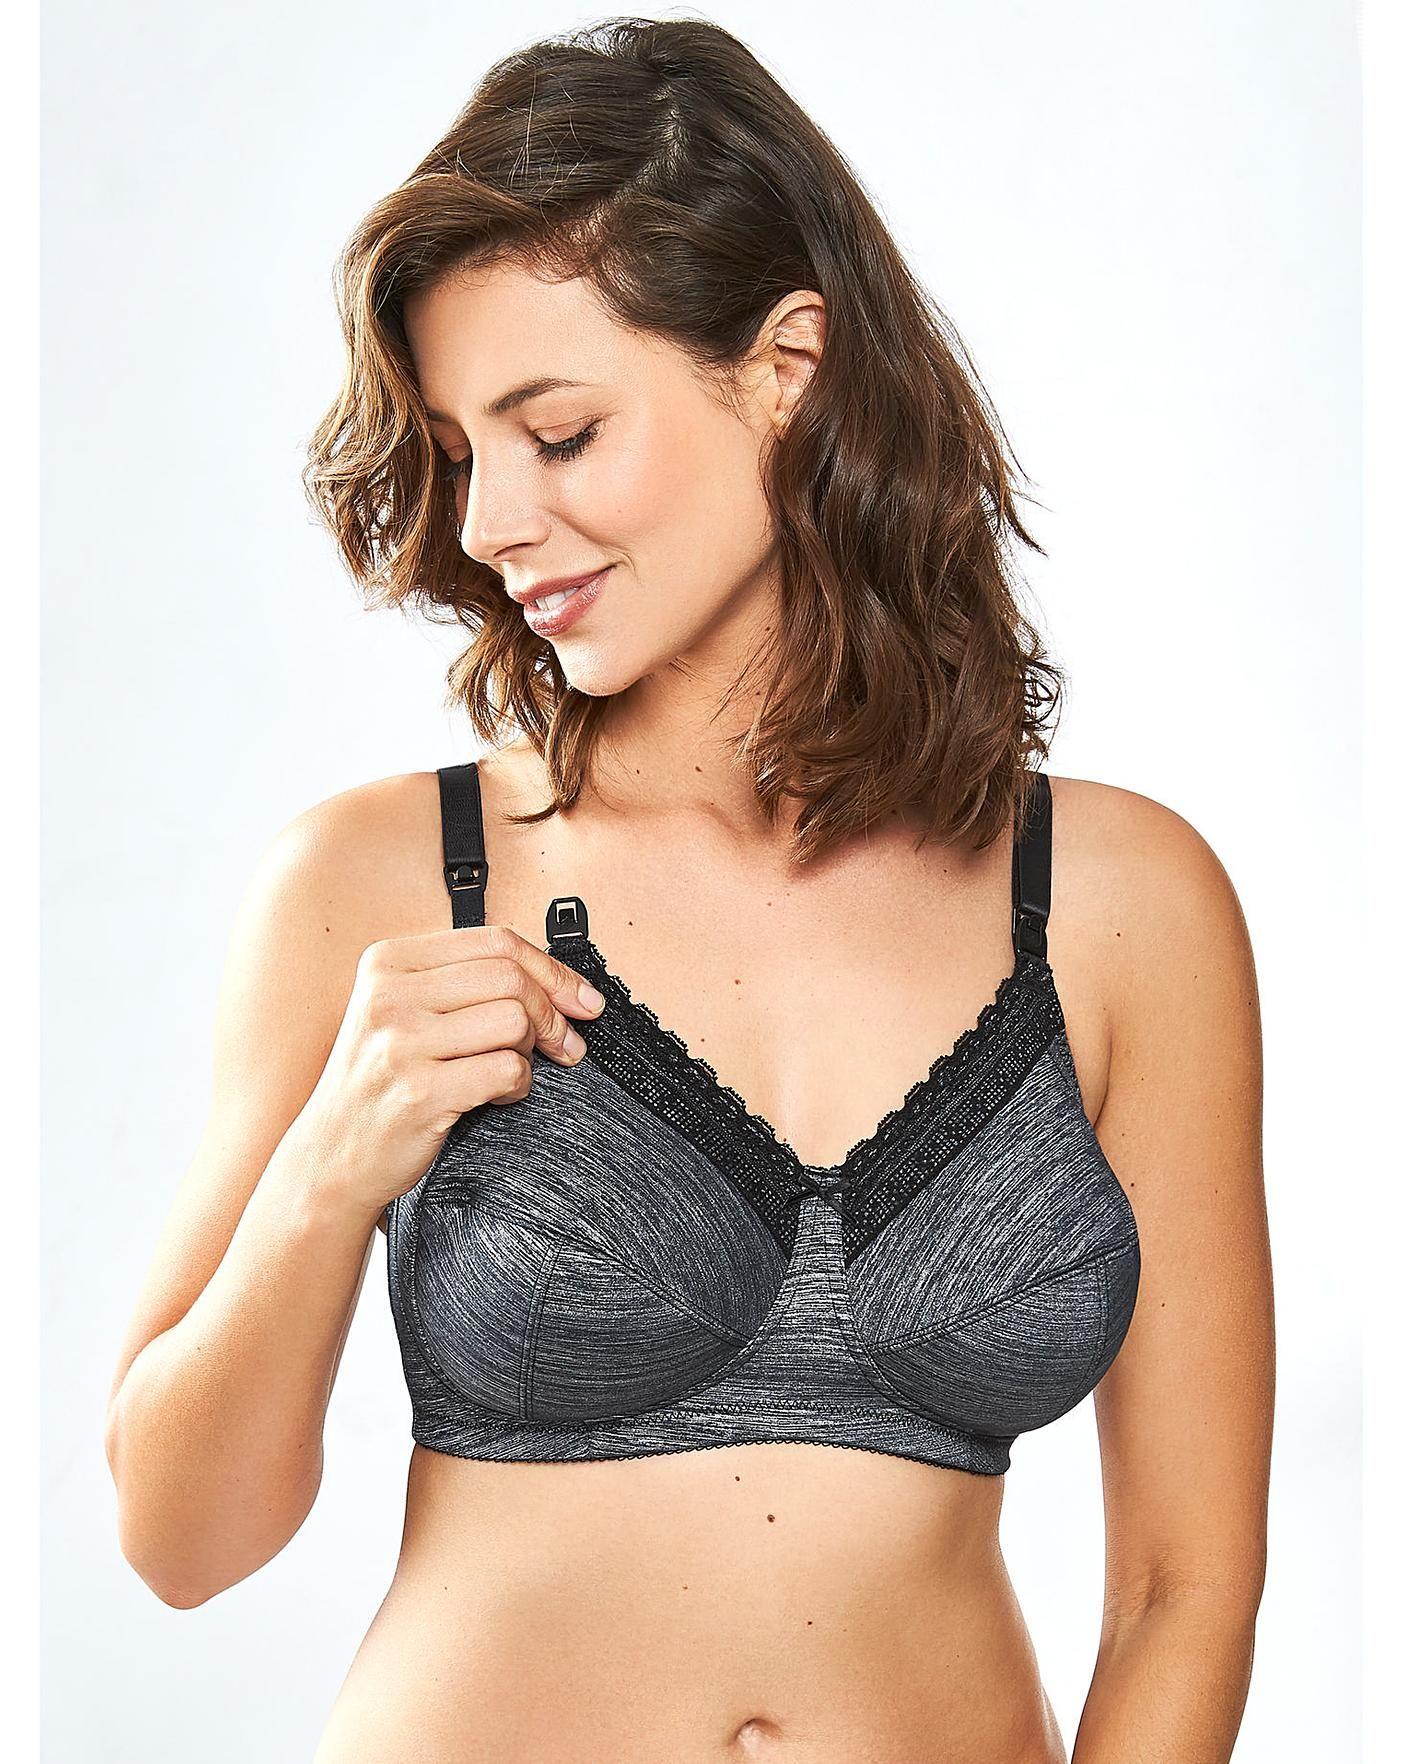 How to choose a maternity bra - maternity bra tips